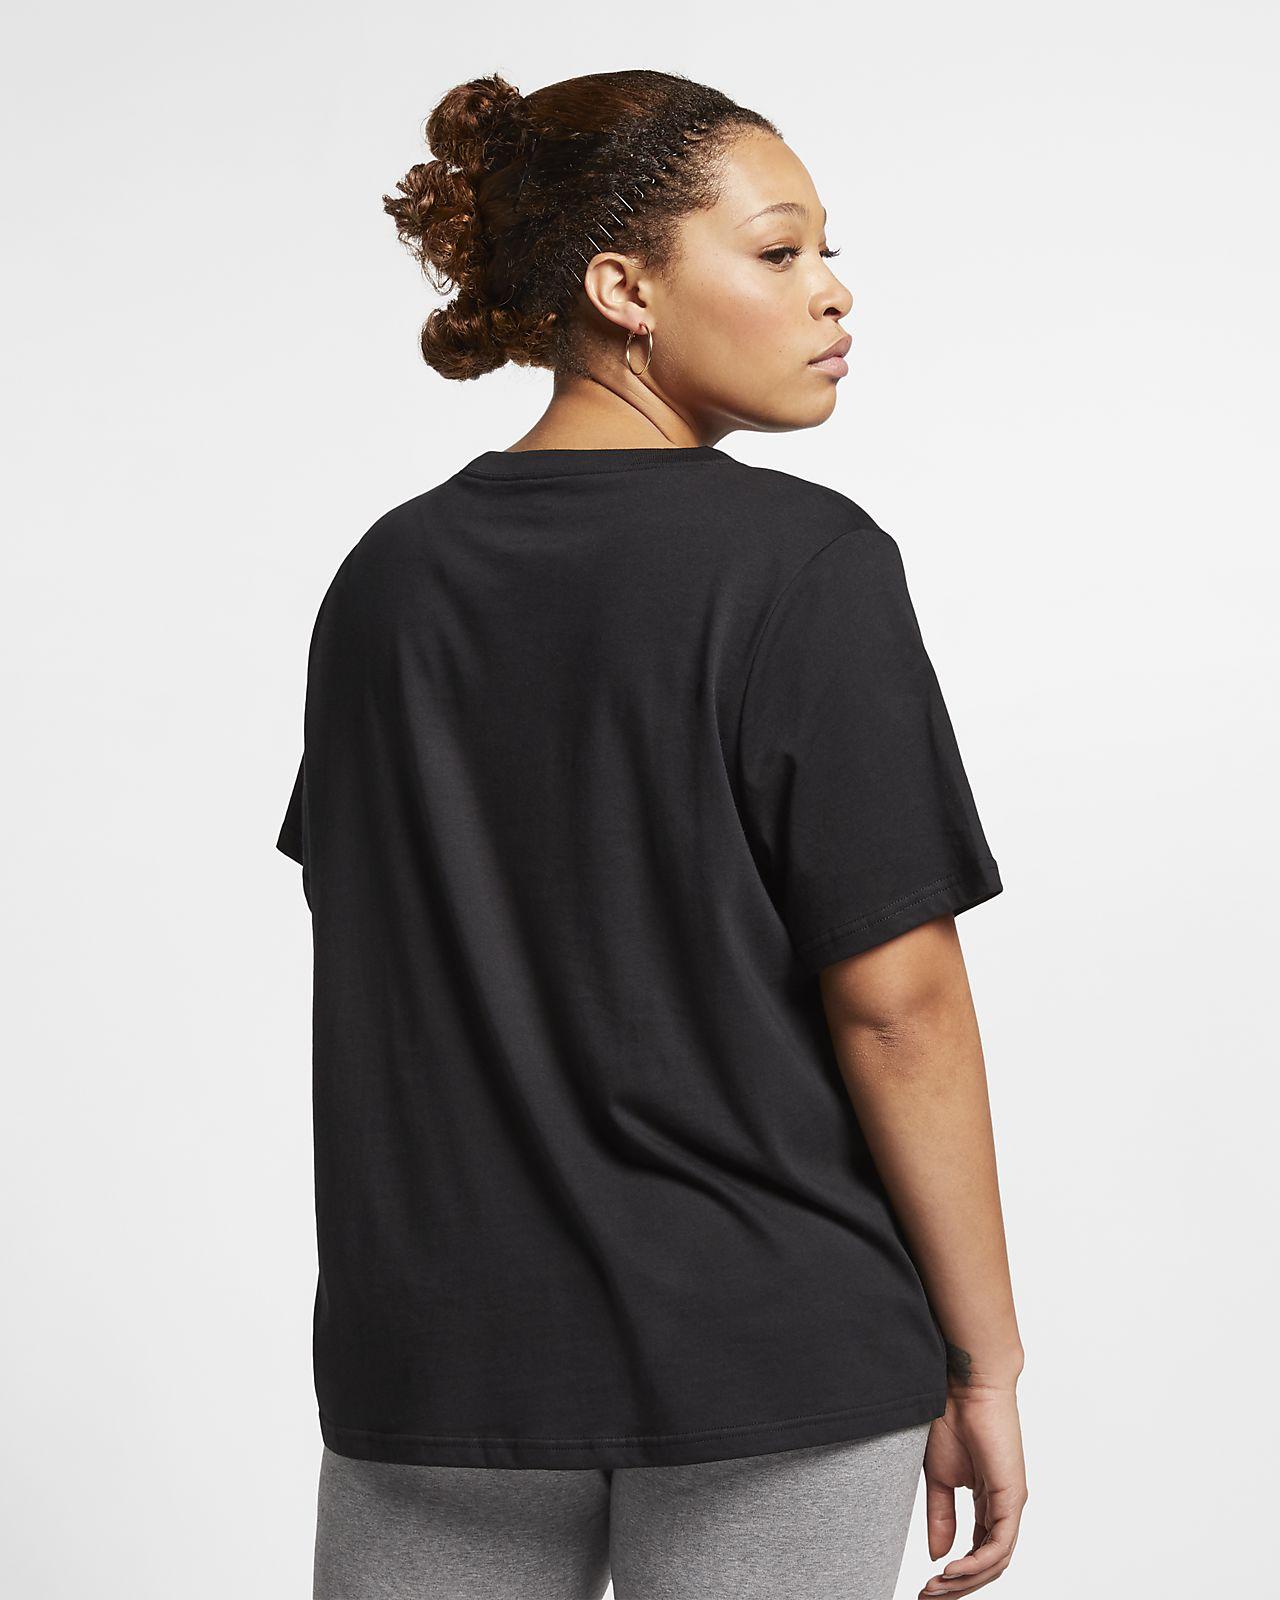 ab7882c5fa0d Tee-shirt Nike Sportswear Essential pour Femme (grande taille). Nike ...